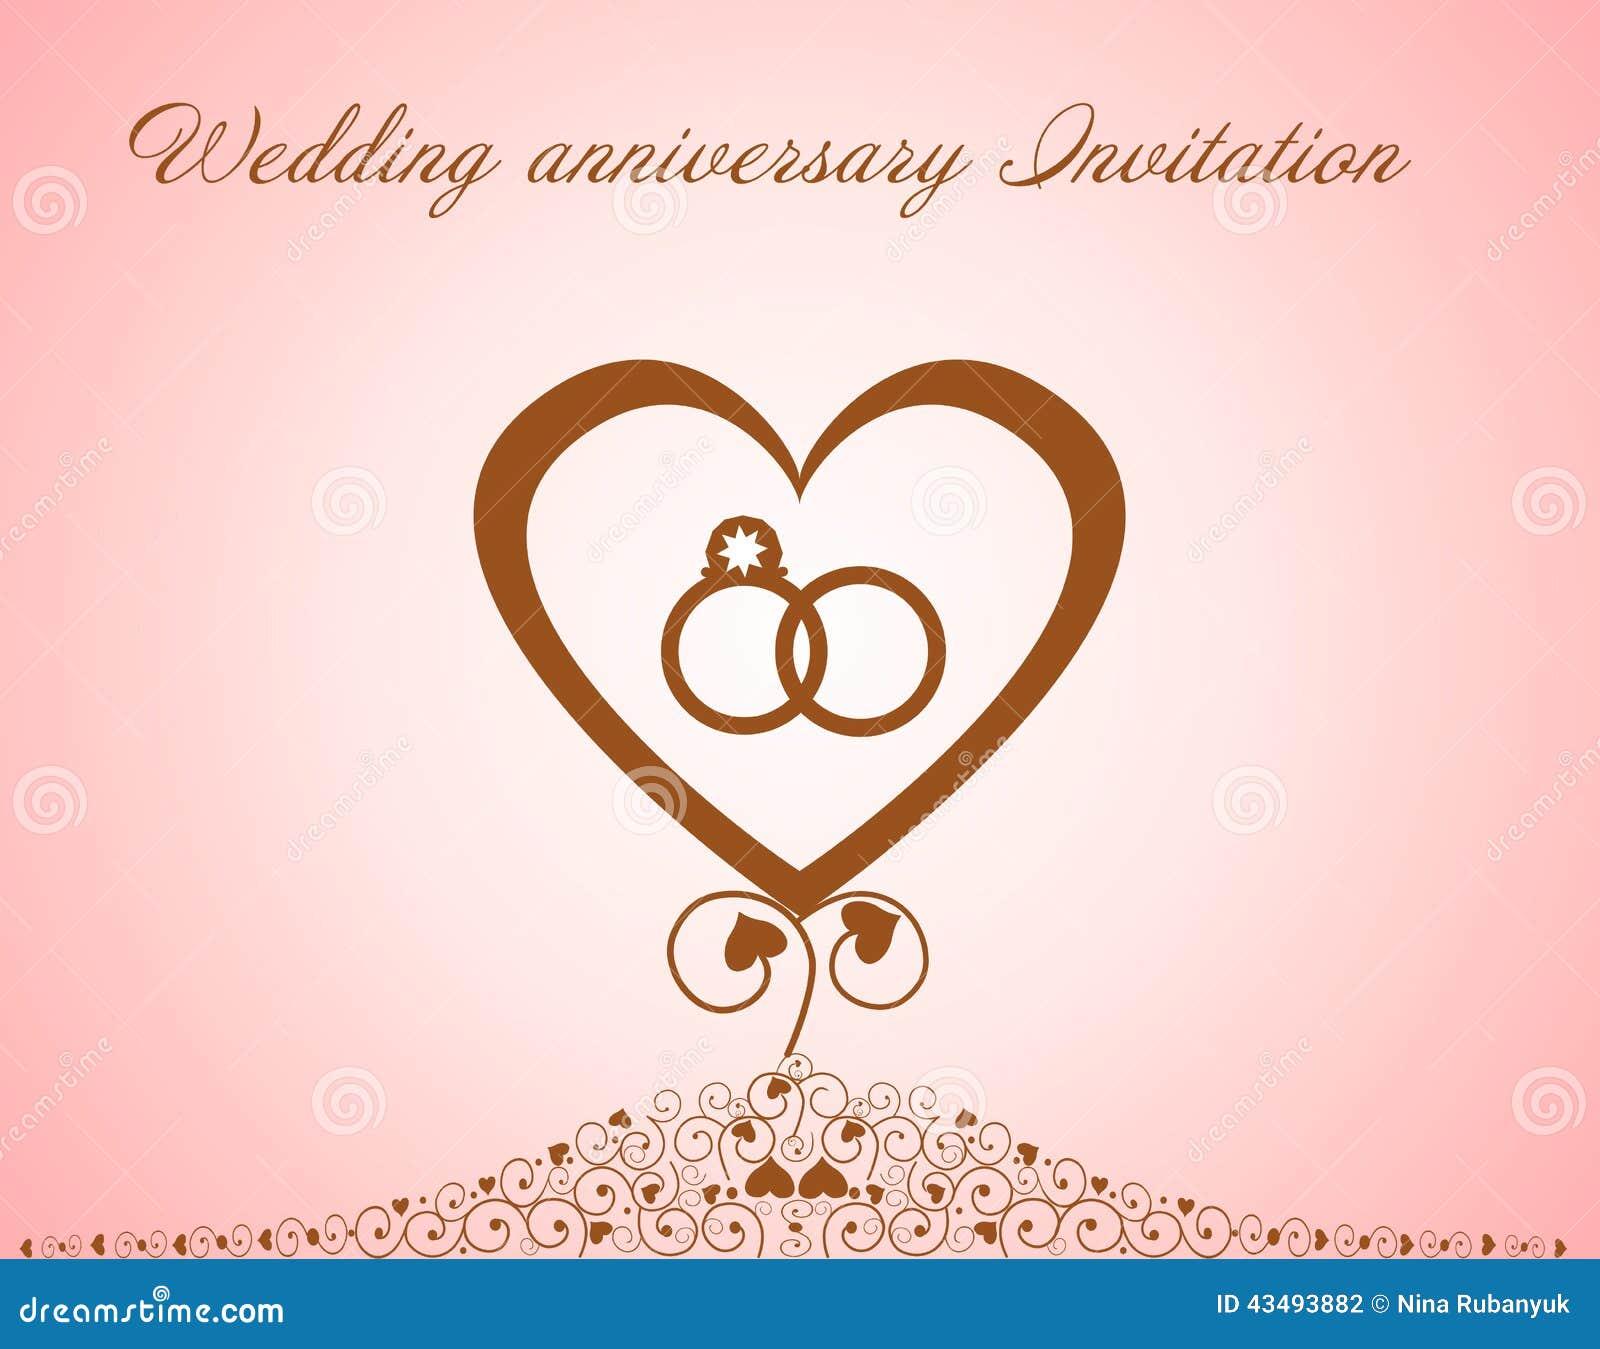 Romantic Wedding Invitations as awesome invitation design